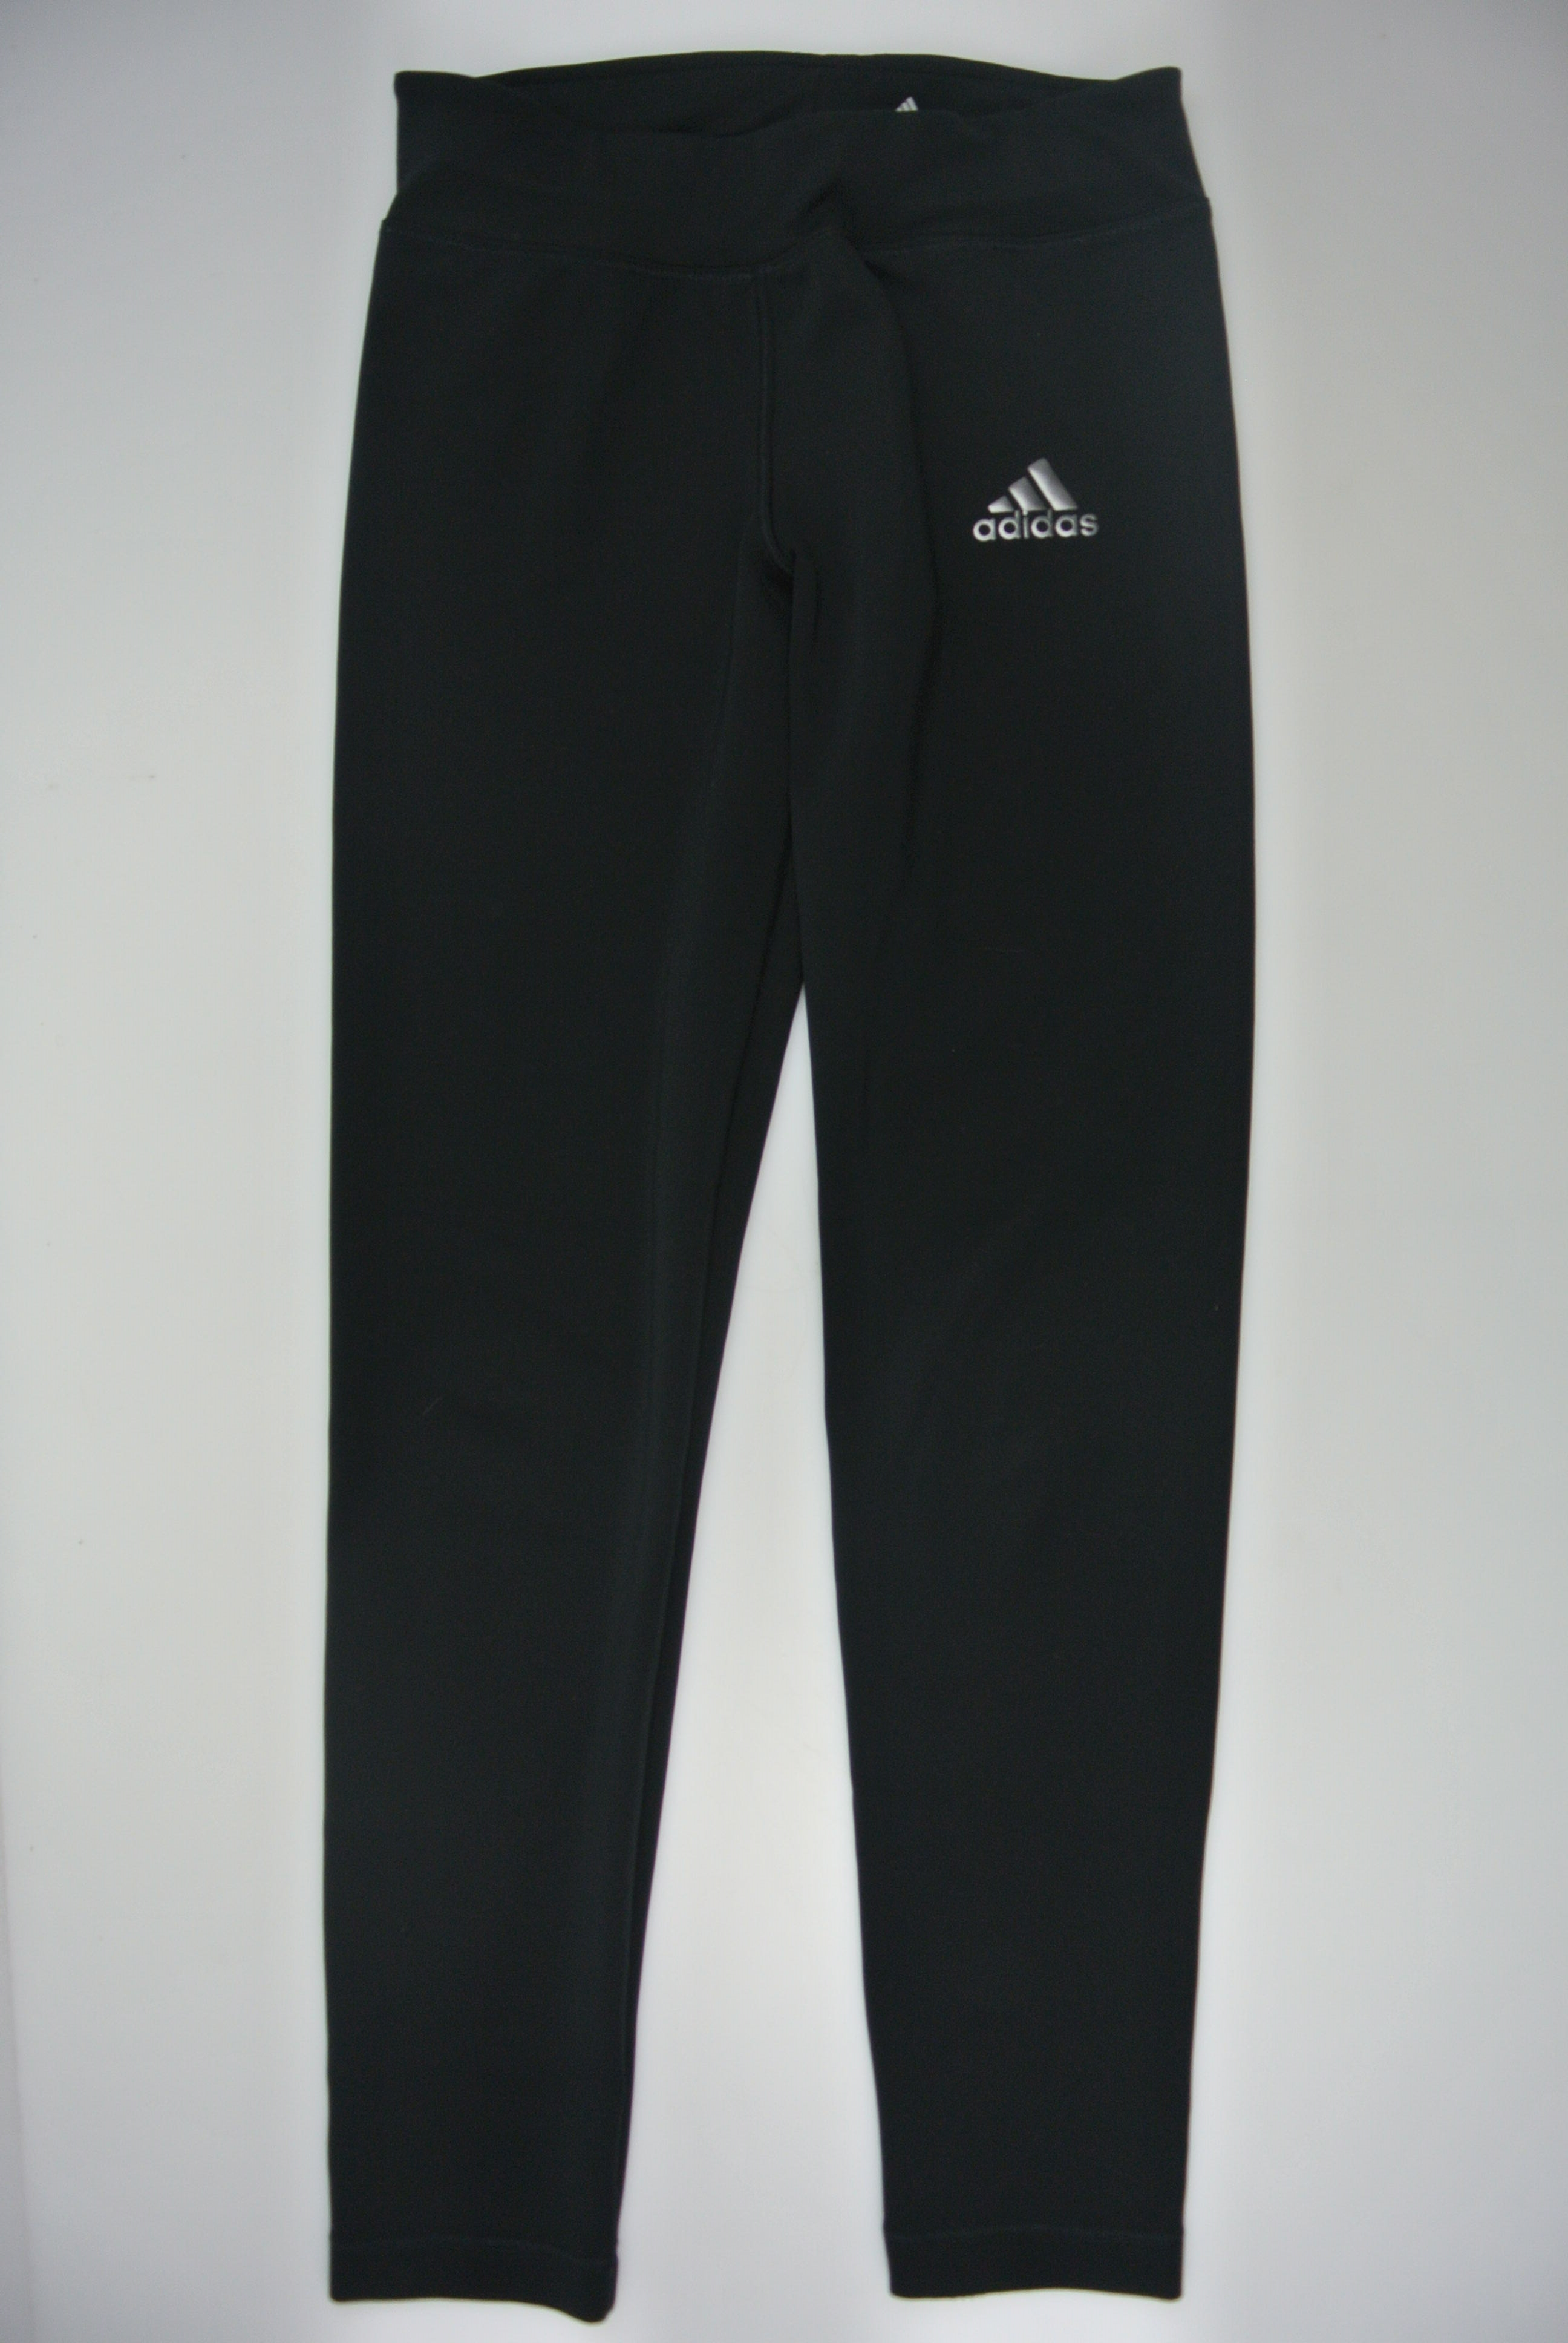 Adidas bukser str 134/140 pige